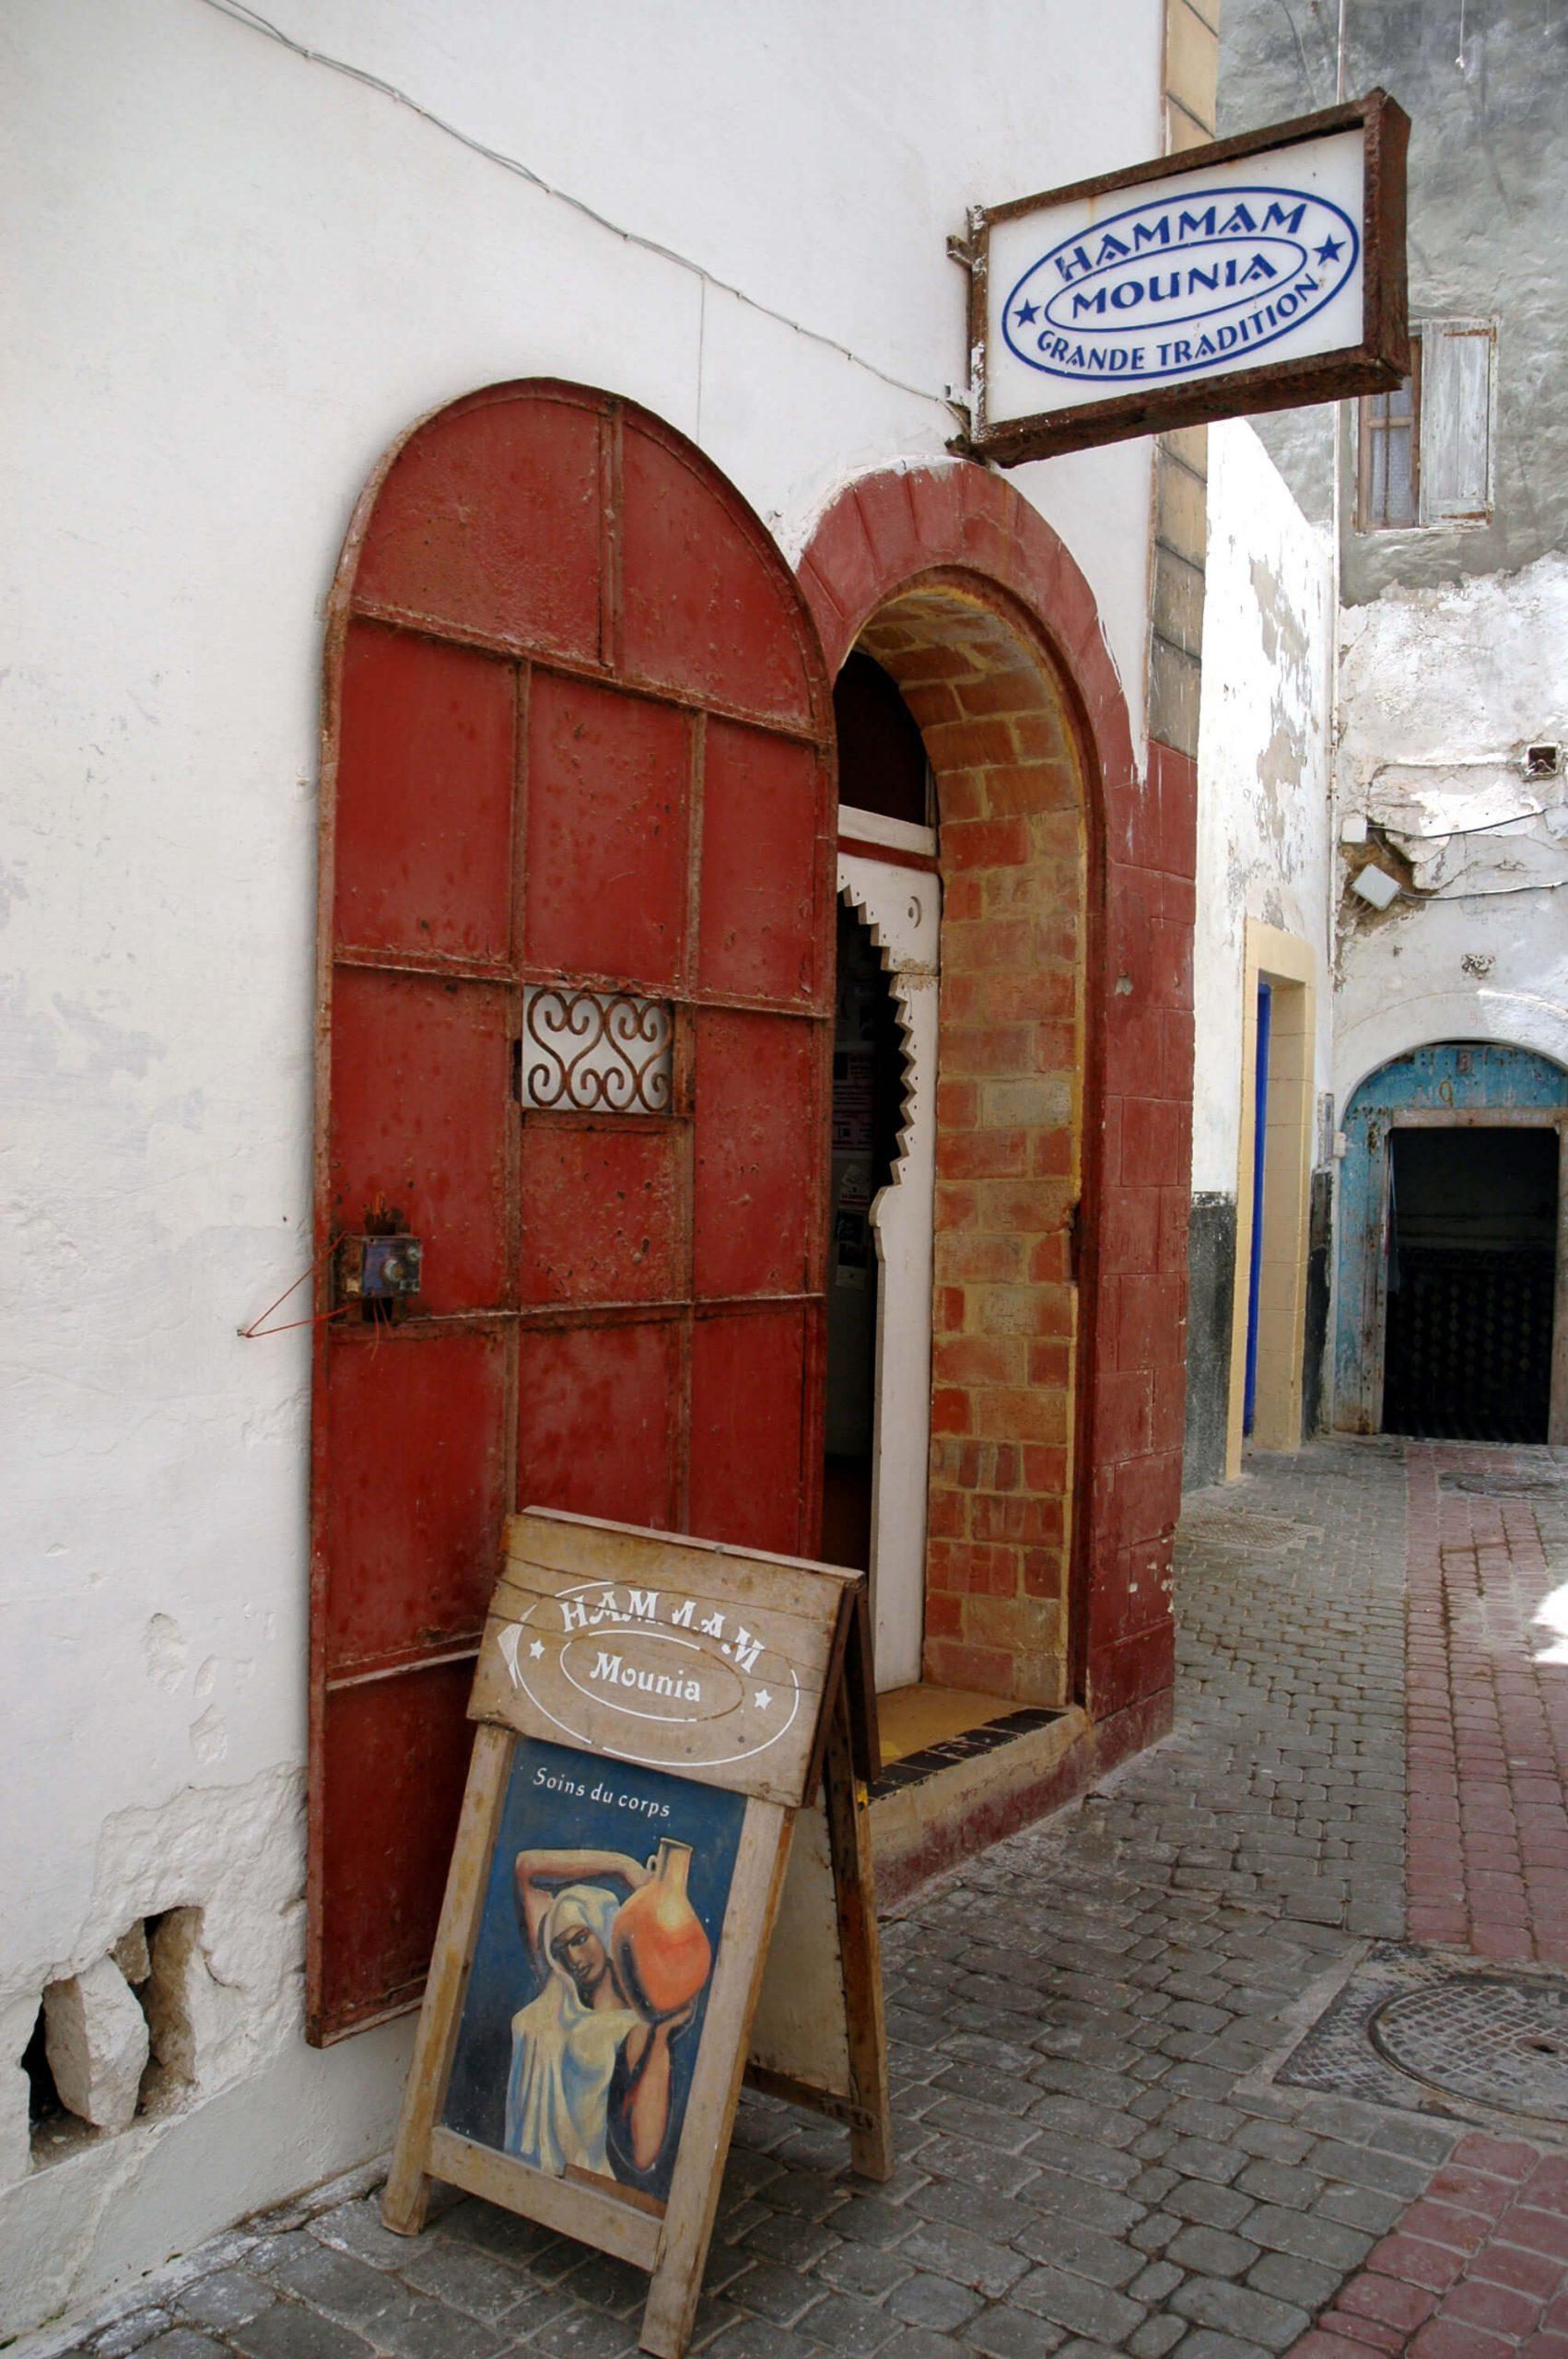 Sahara Desert Tour - The Moroccan Hammam Experience - Moroccan Hammam Skin and Beauty Treatments